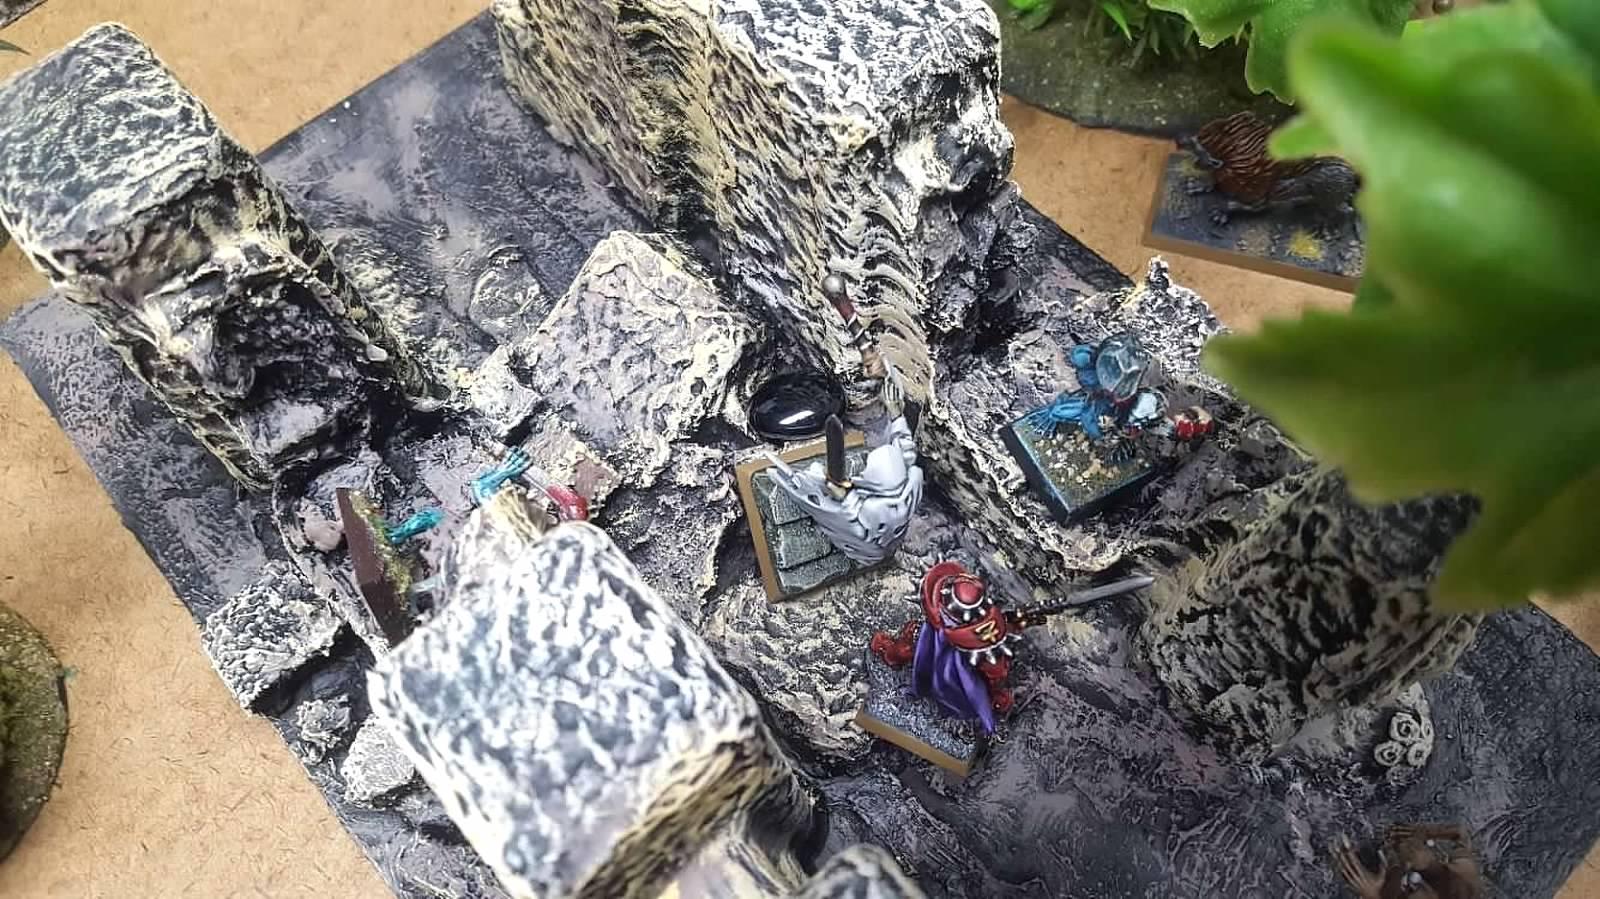 Pyrates of the Karribean VI.a--Dead Man's Hand - Page 7 47a8d937b3127cce98549ead810700000010100AbOXDRkzbMmWA